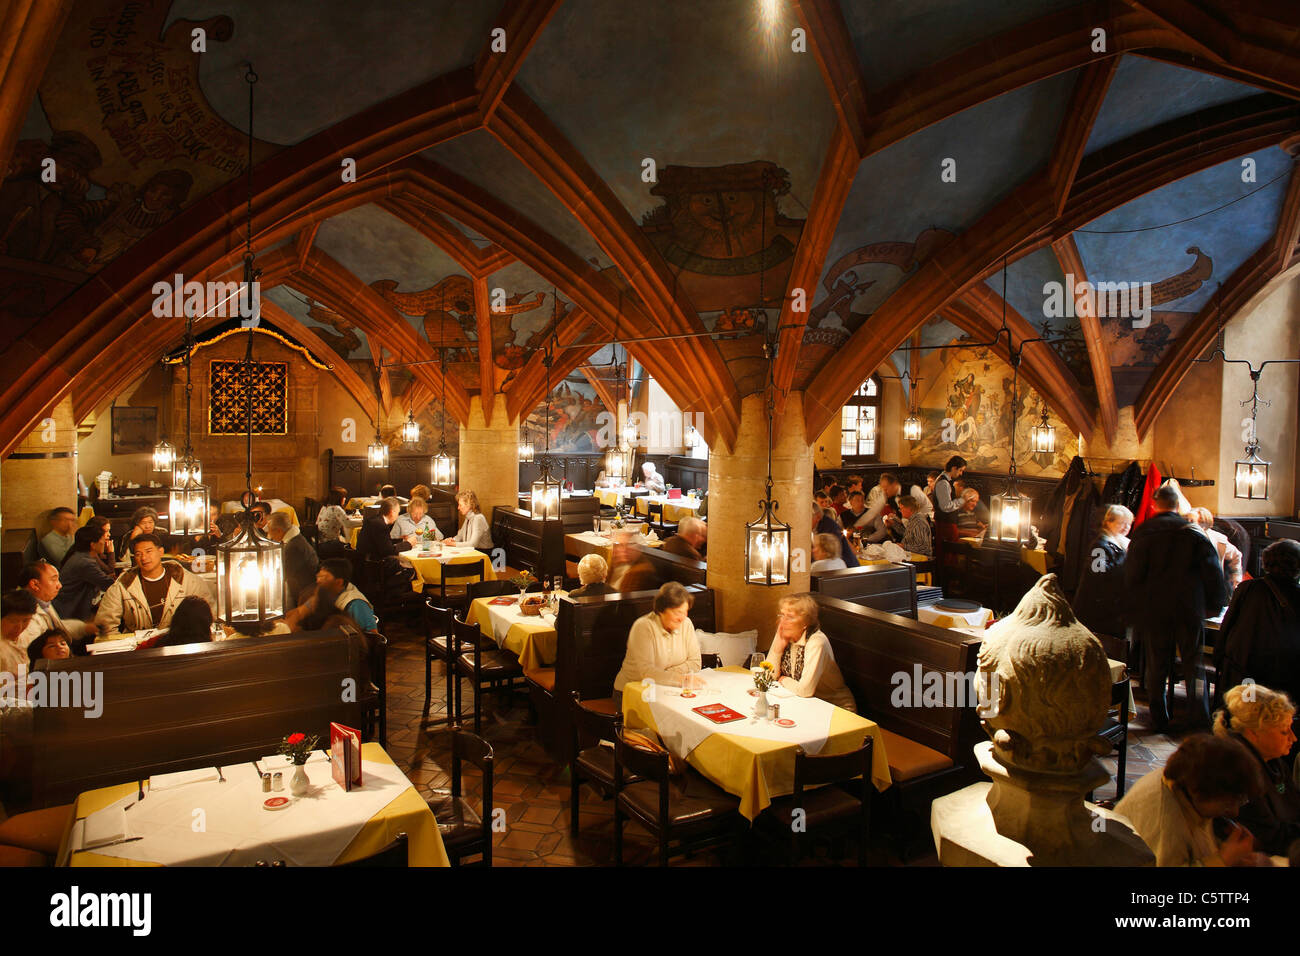 Munich Ratskeller Restaurant Food Images